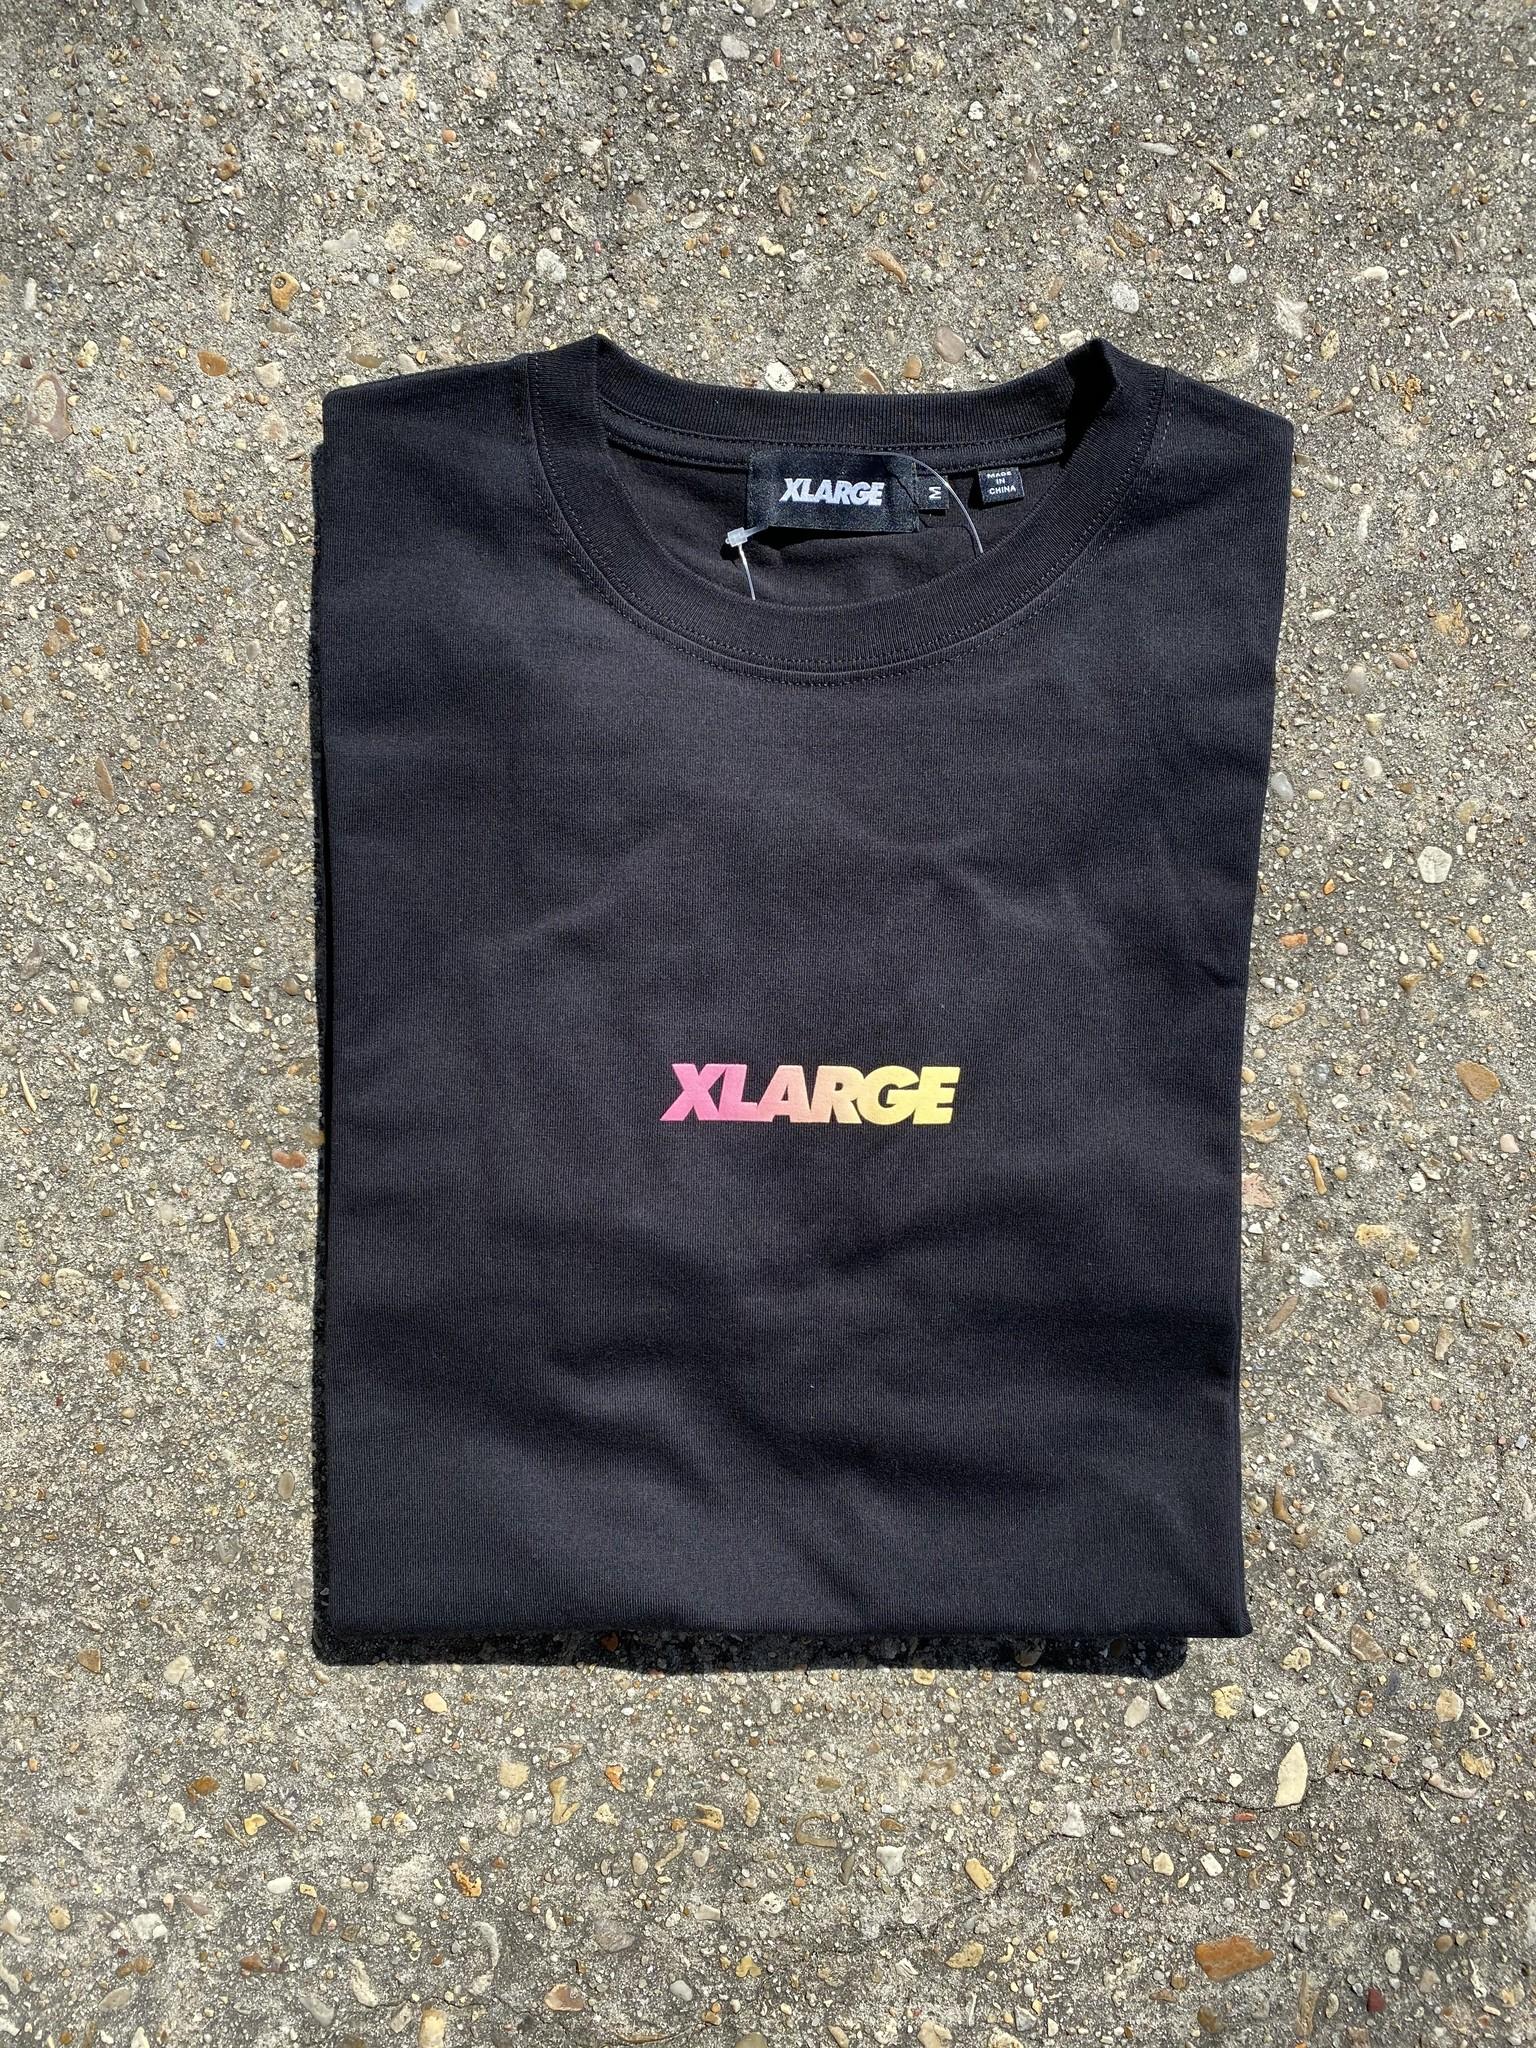 XLarge Foam Print Standard Logo